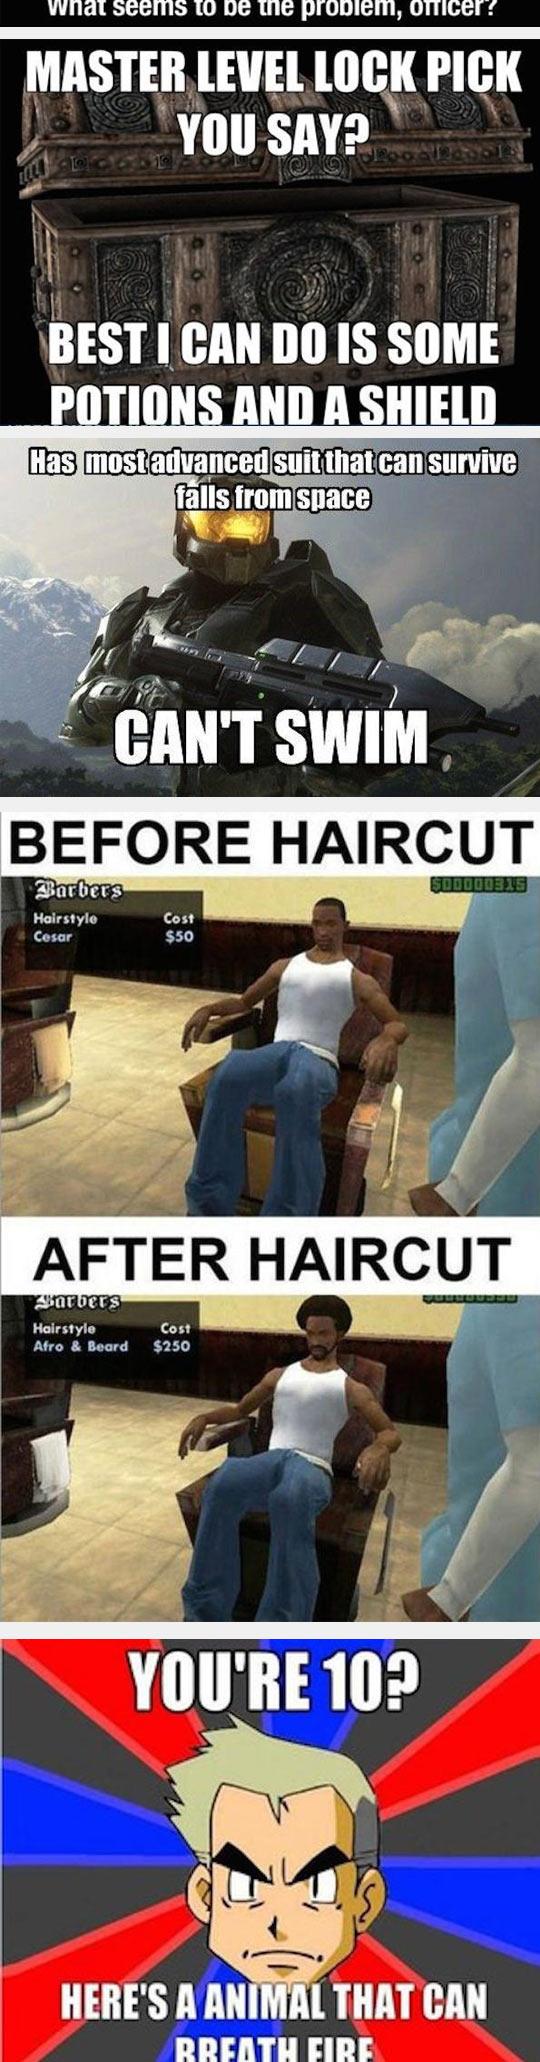 funny-video-game-GTA-logic-Crisis